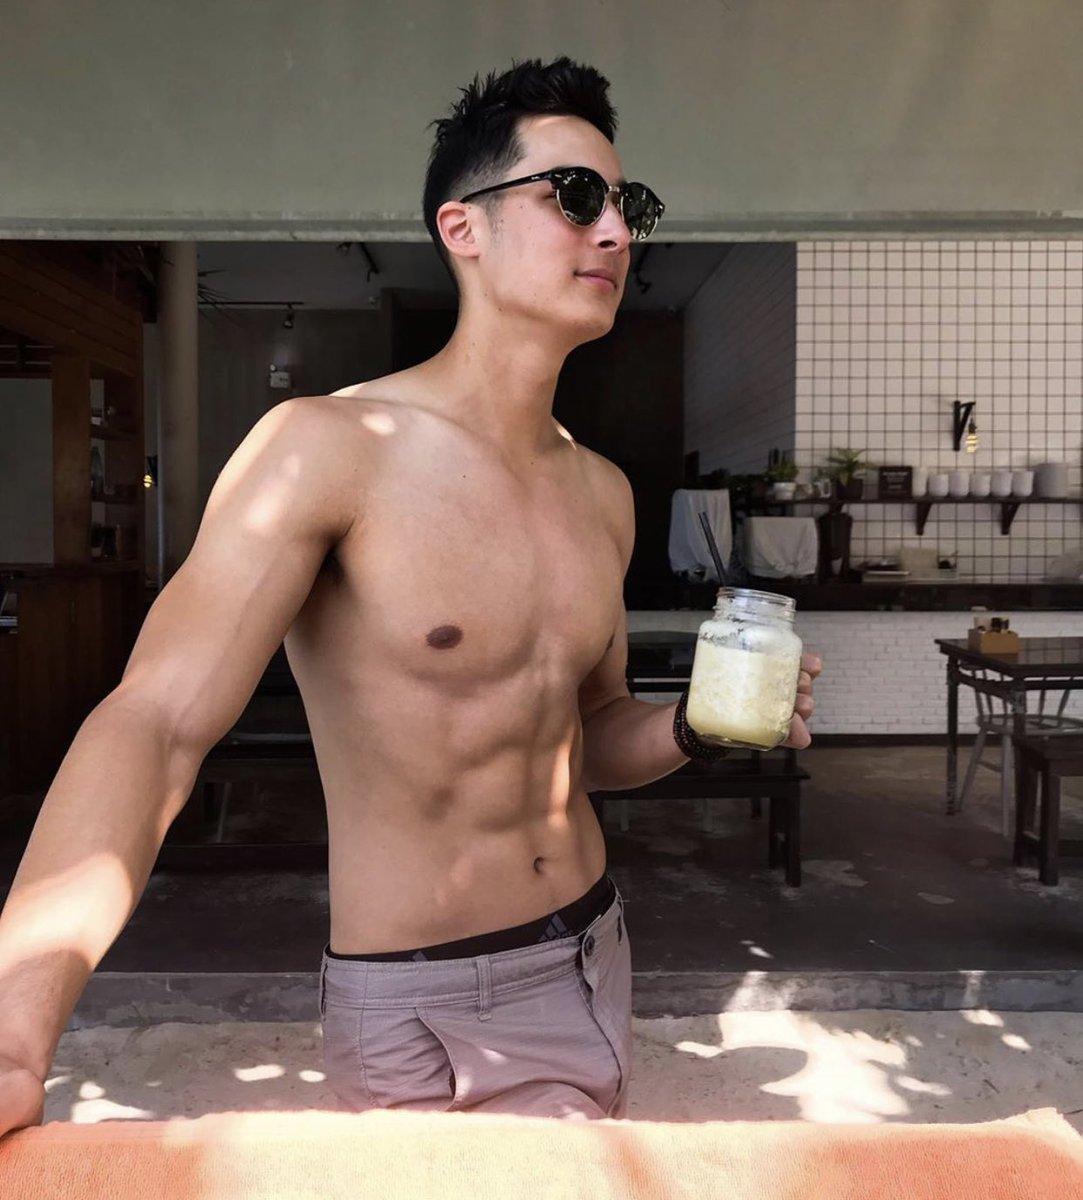 IG: baeph.spotted #baephspotted  #pinoy  #sexypinoy #pinoybae #pinoymodel  #model #malemodel #pinoy #pinoymodel #pogi #bae #baeph #hotpinoy #pinoyunderwear #cutepinoy #filipino #likesforlikesback #likesforlikes https://t.co/AVQIss9ApJ